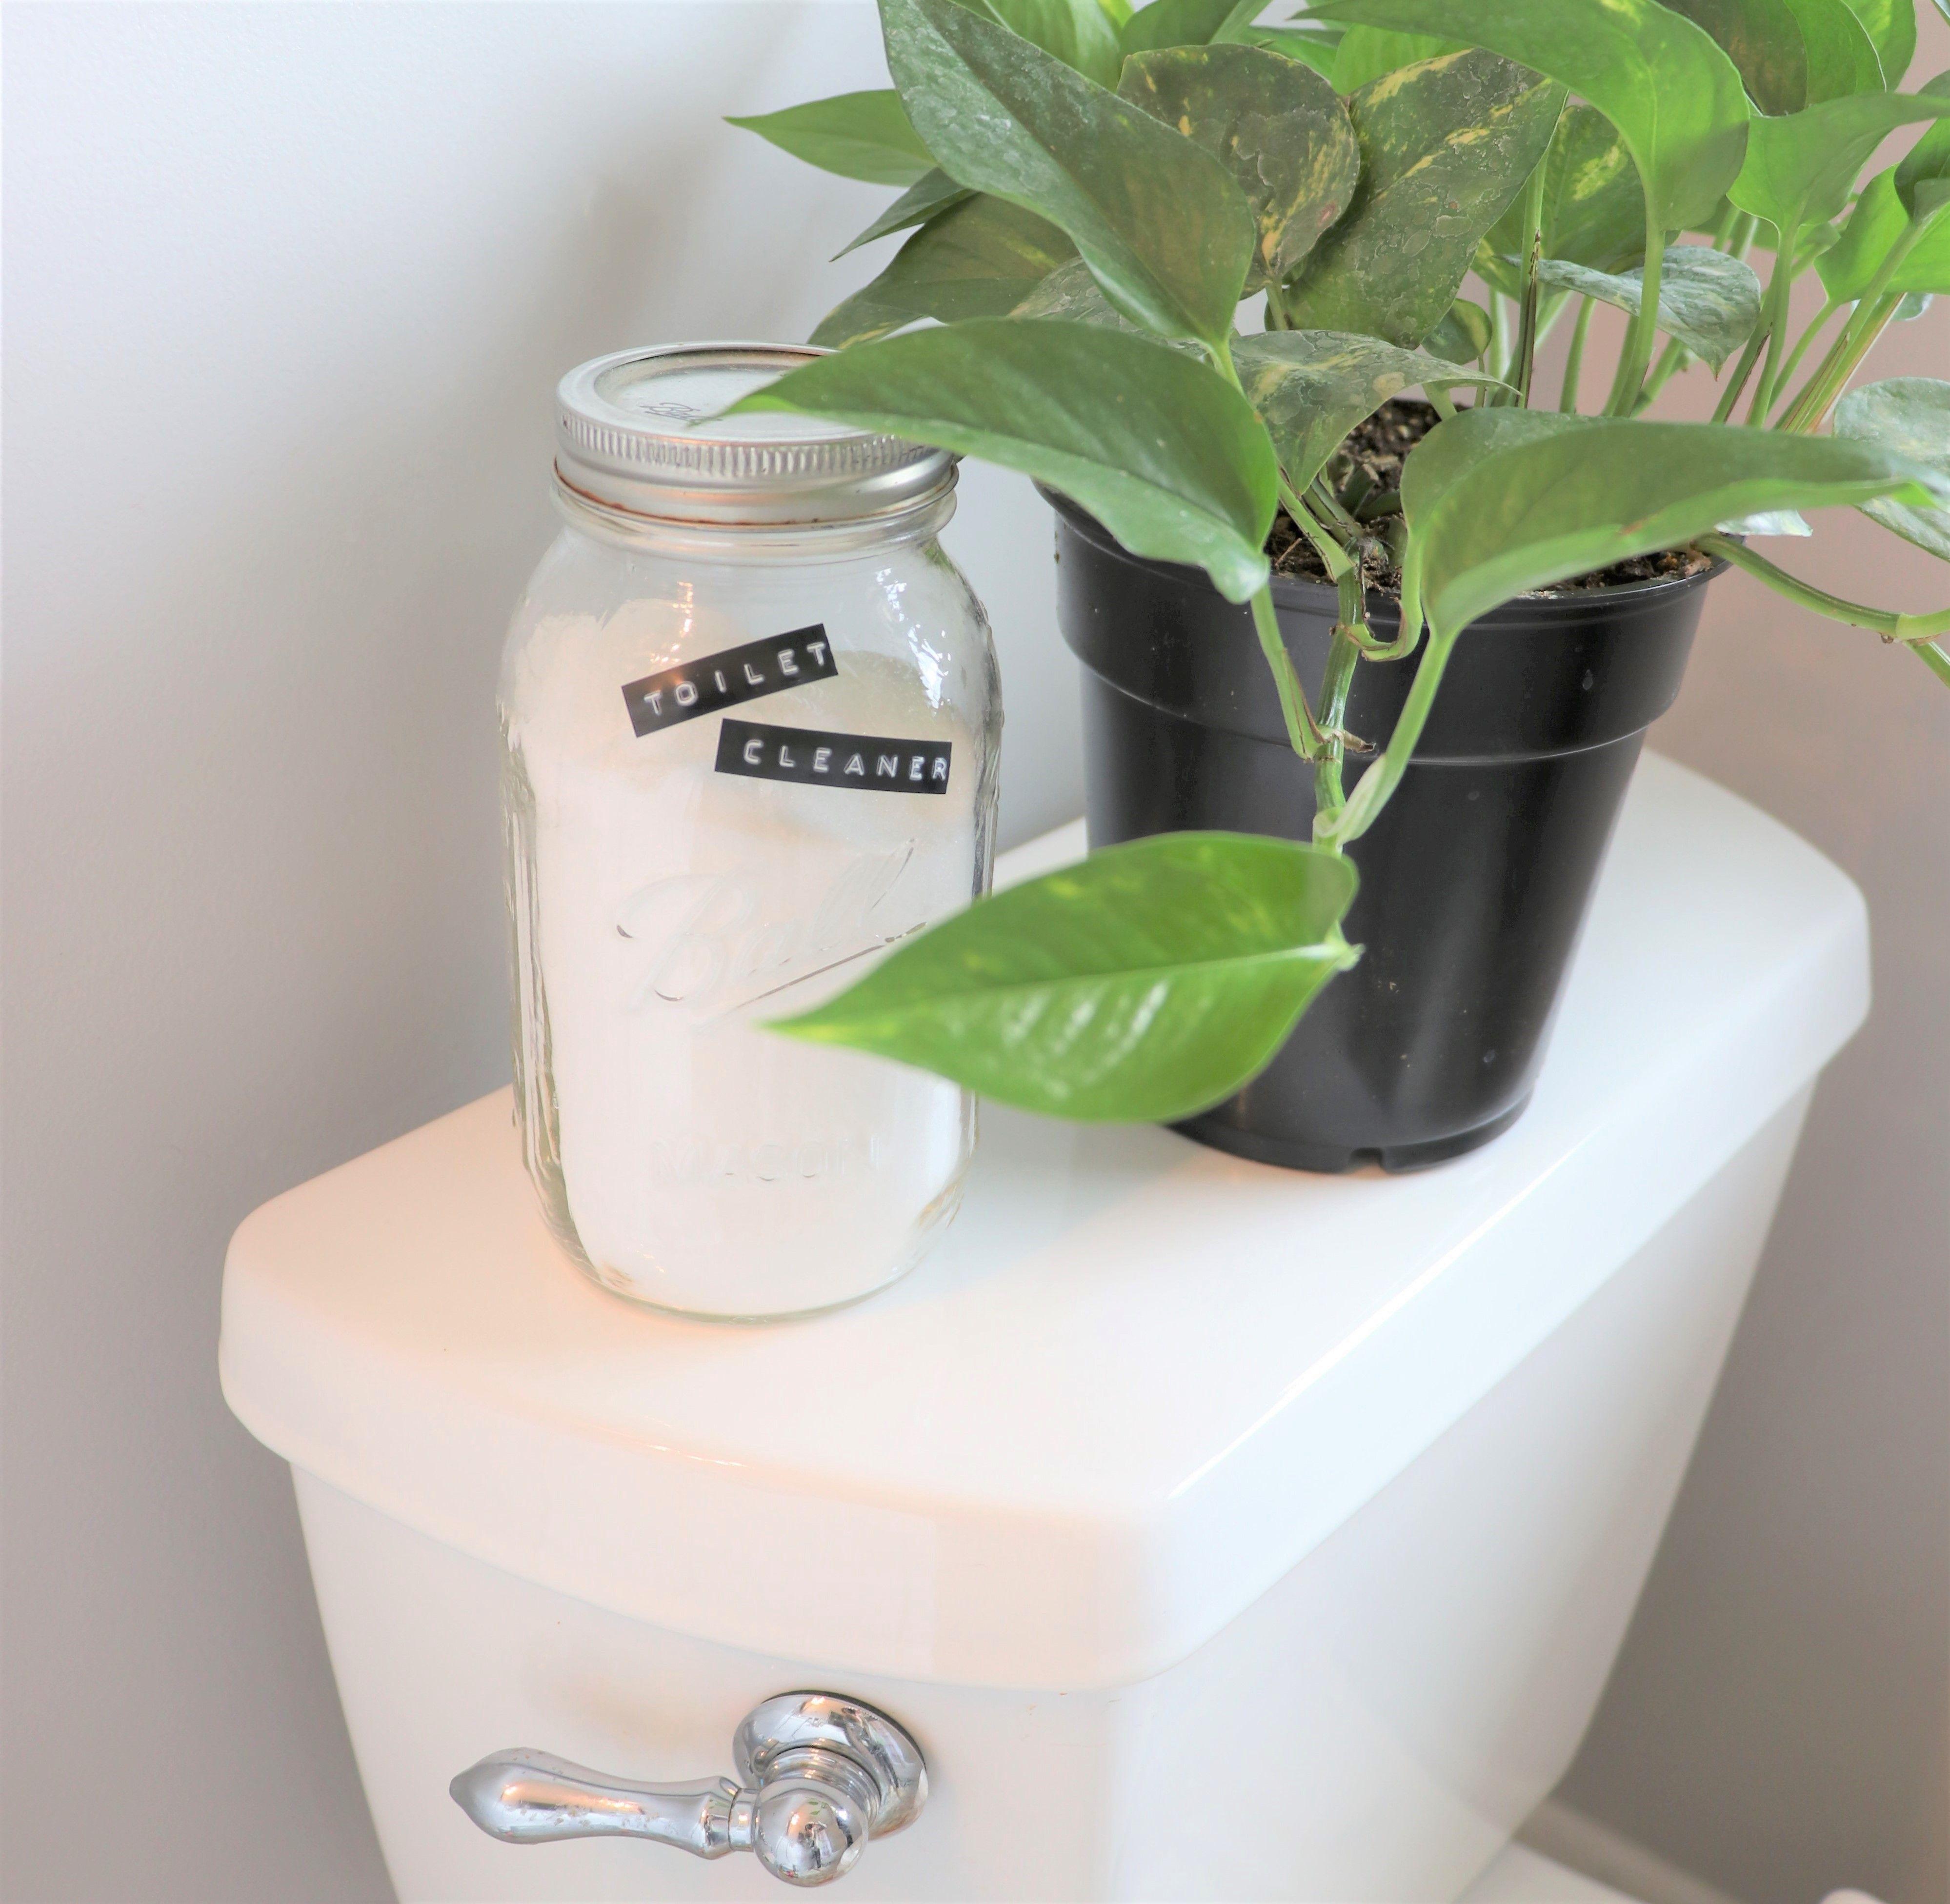 diy toilet cleaner recipe citric acid baking powder and pop